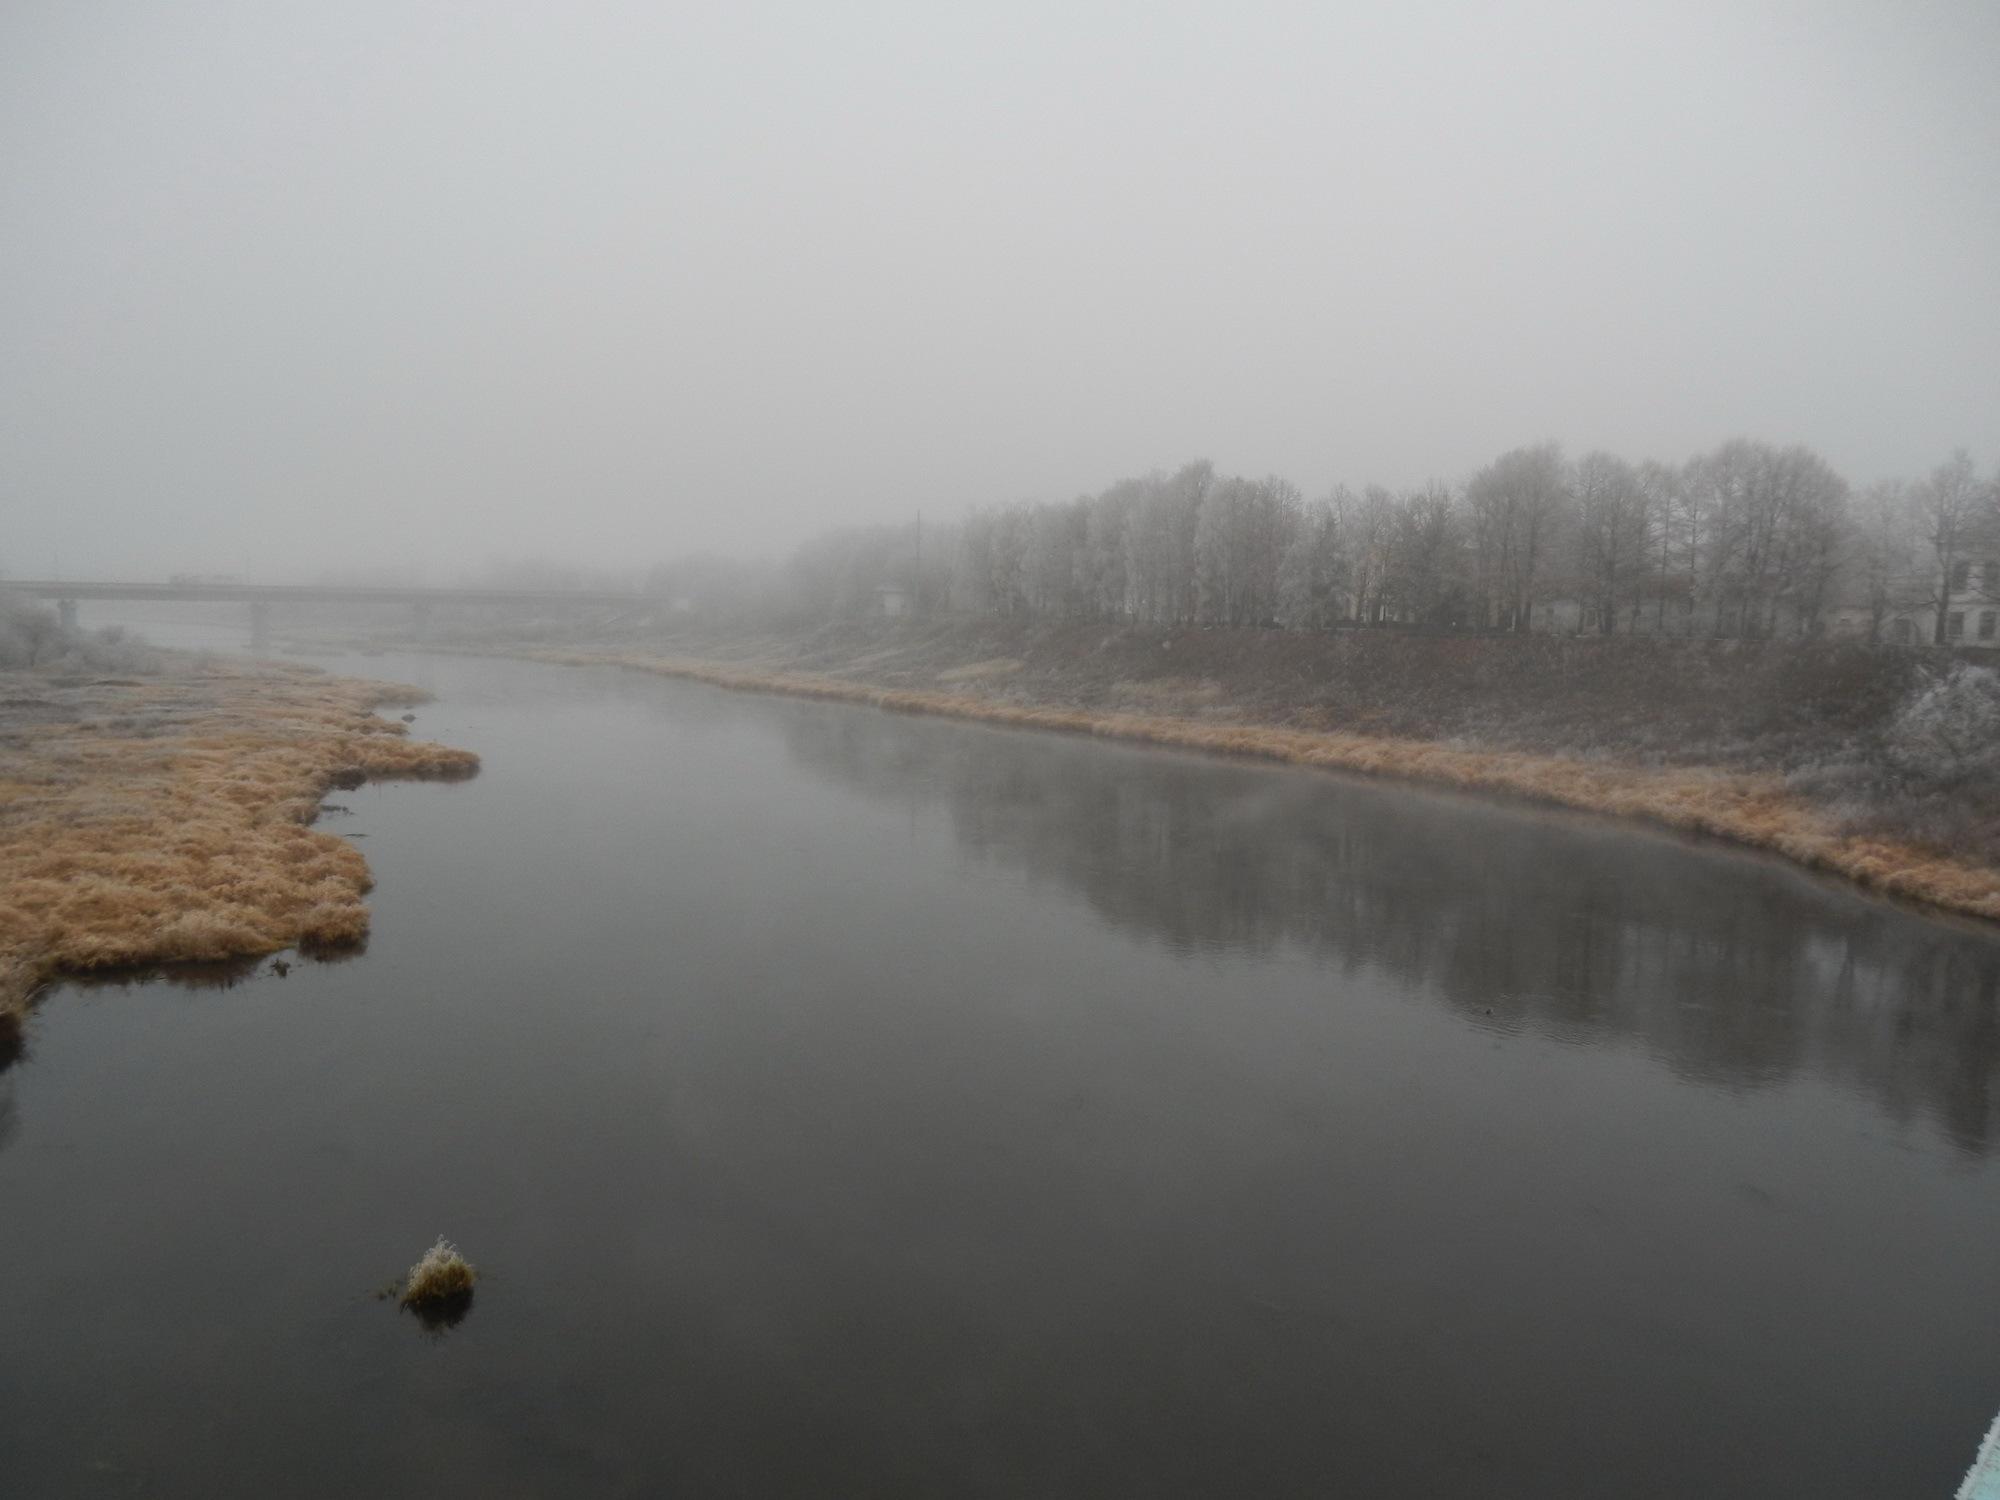 Frozen Fog by Yurkoff Wladimir